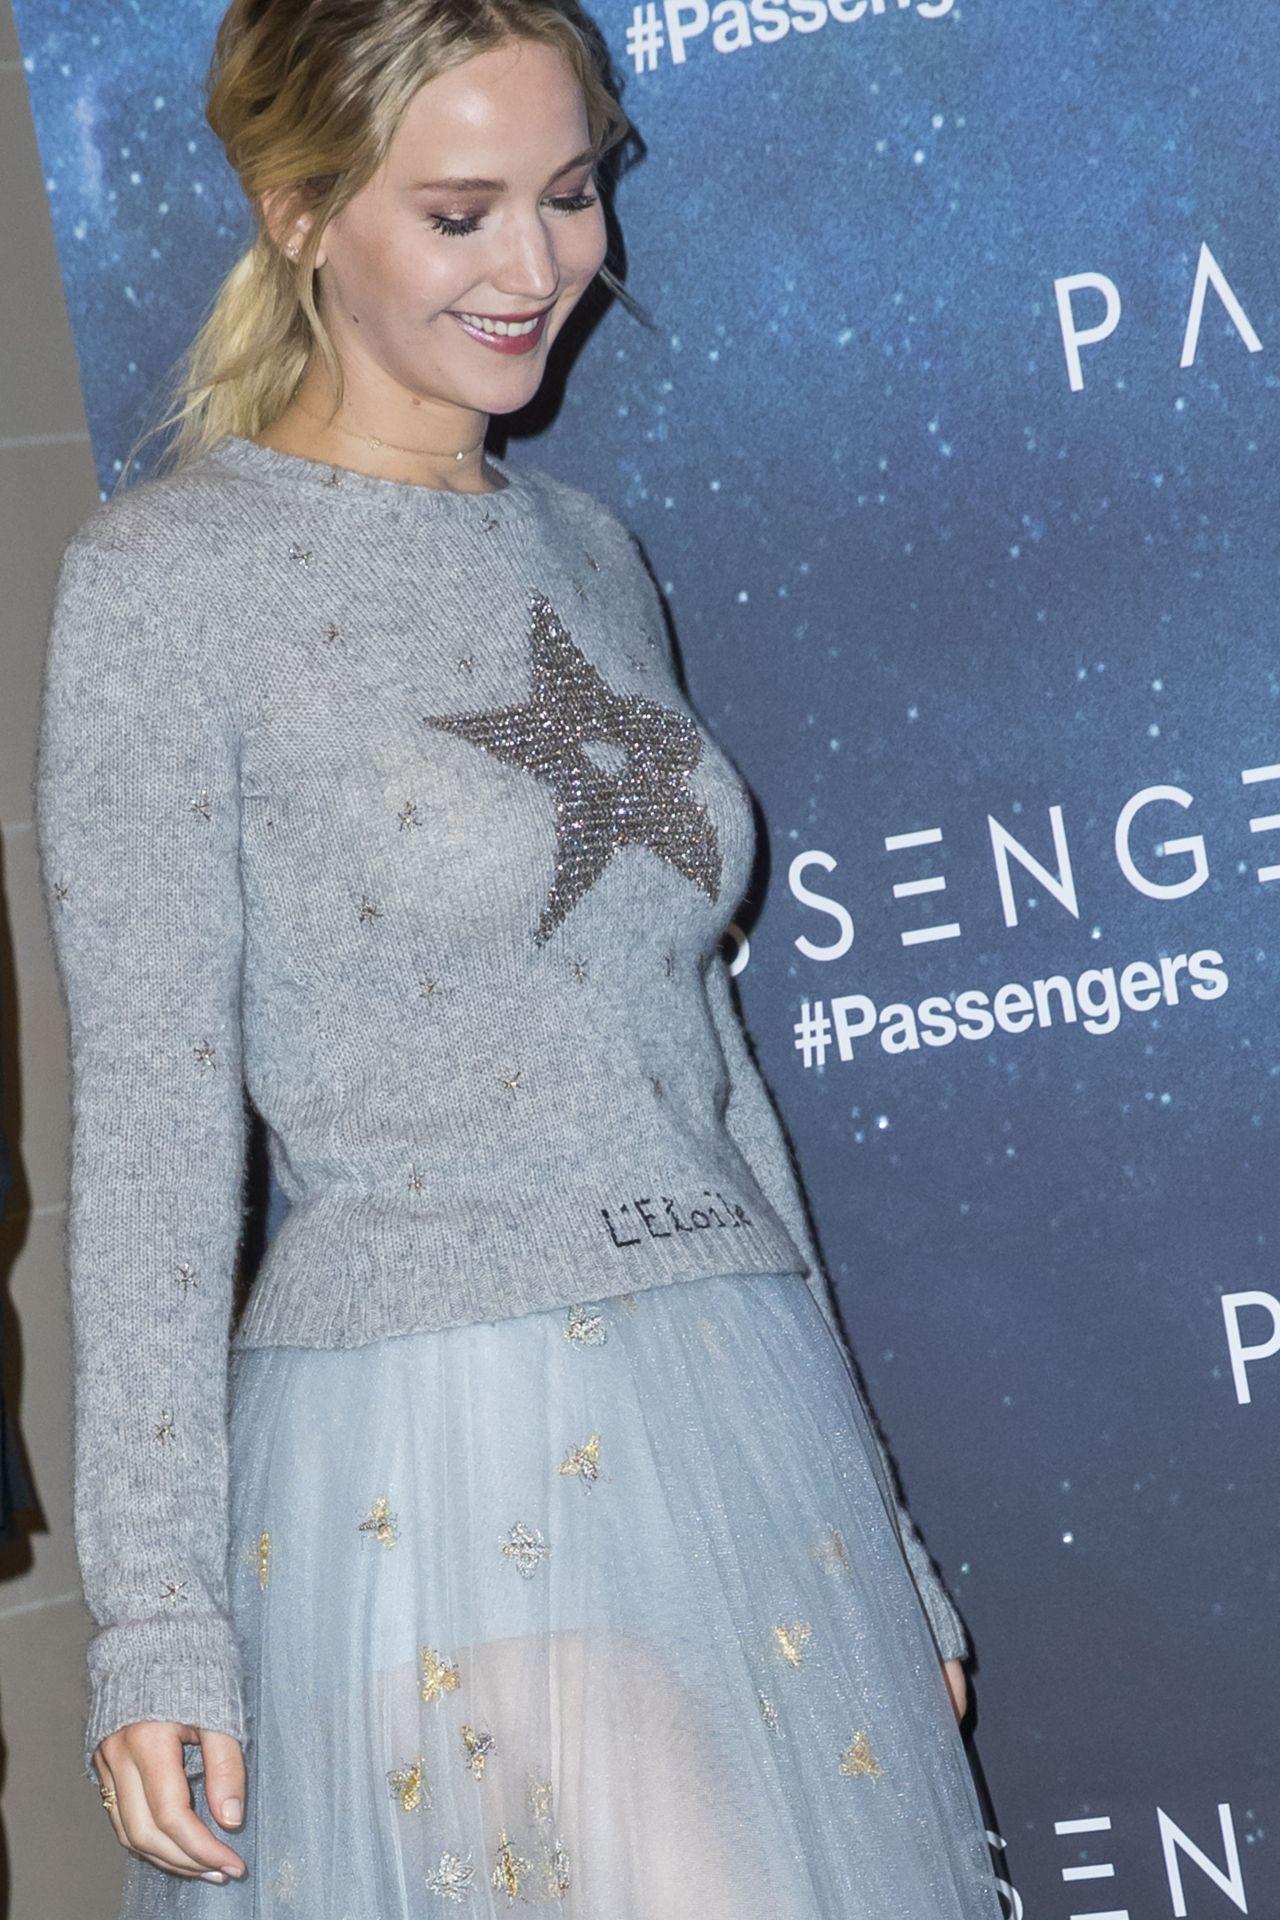 Jennifer Lawrence Passengers Photocall In Paris 11 29